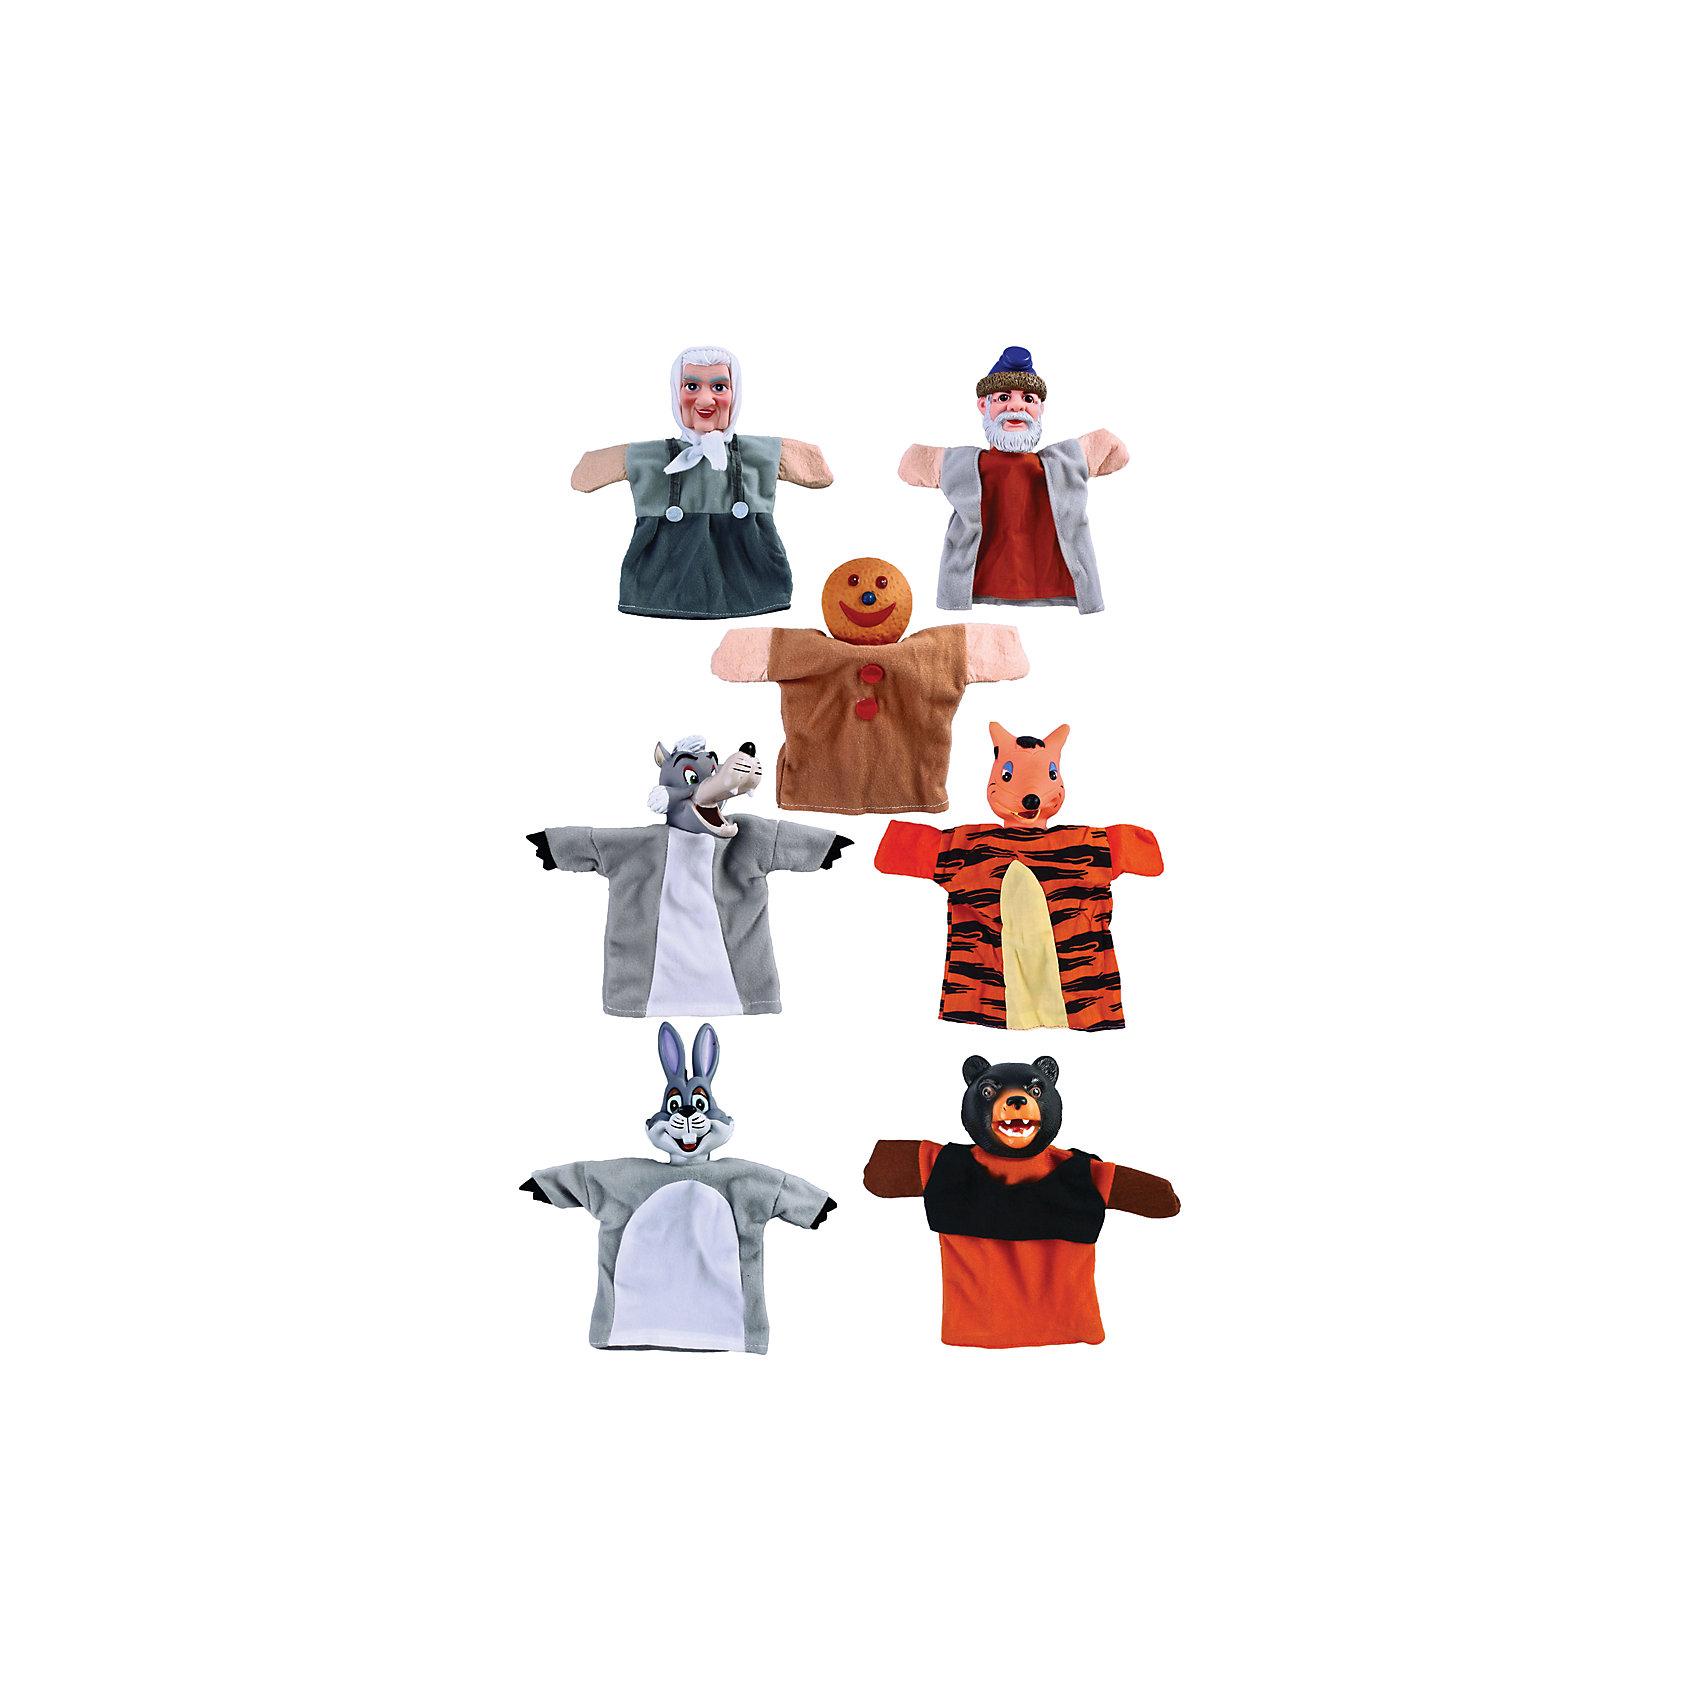 Жирафики Кукольный театр Колобок, 7 кукол, Жирафики игровой набор жирафики кукольный театр буратино 8 предметов 68344